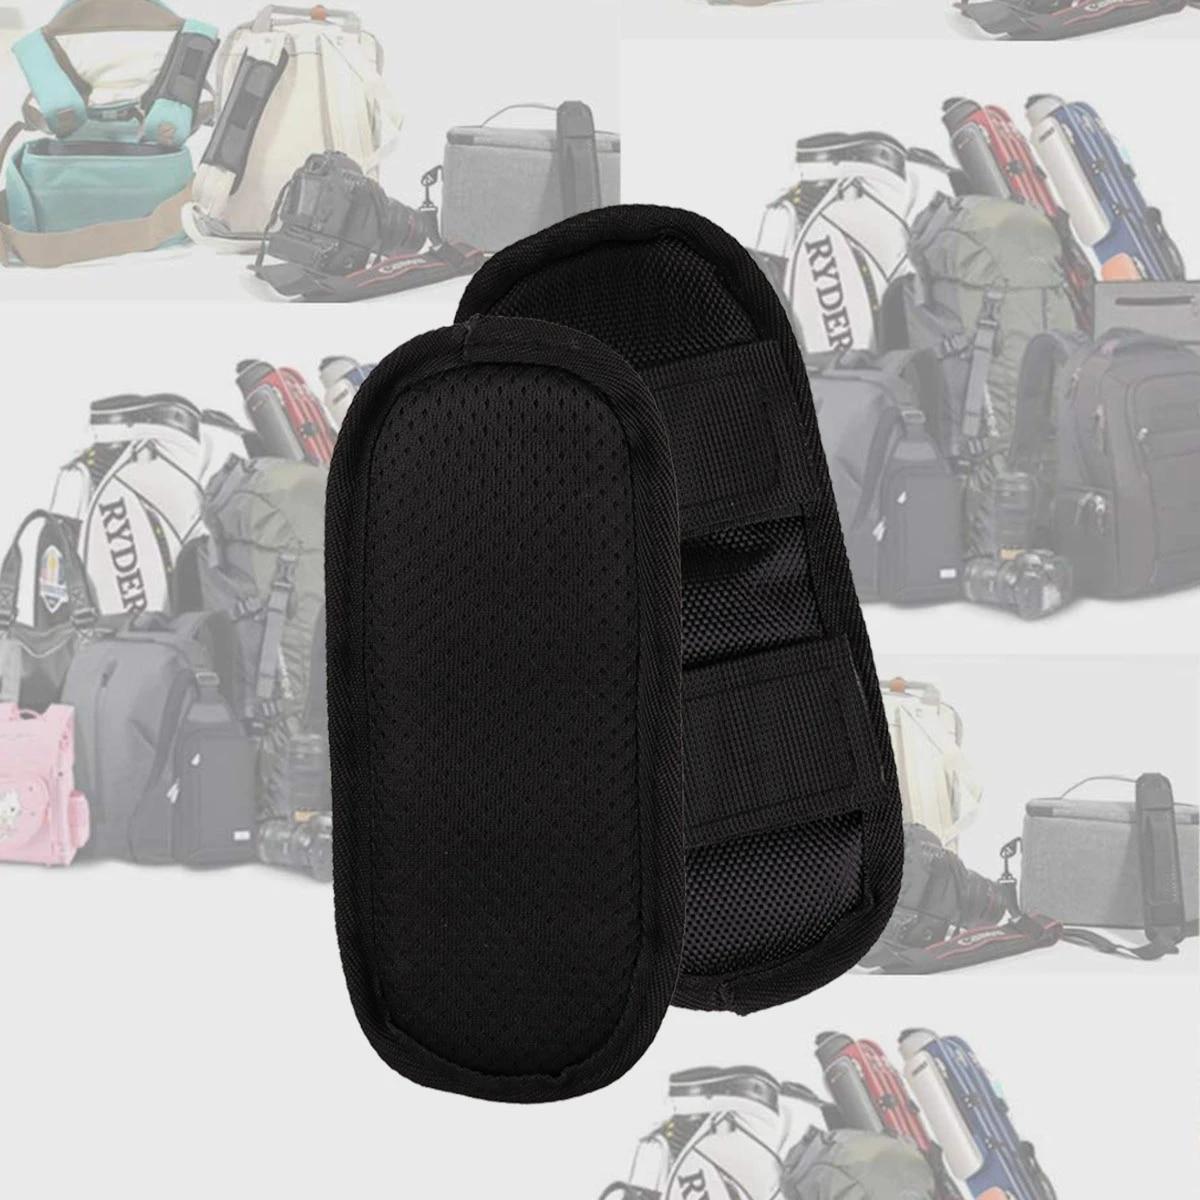 Durable Breathable Soft Padded Shoulder Strap Pad Non Slip For Backpack Rucksack